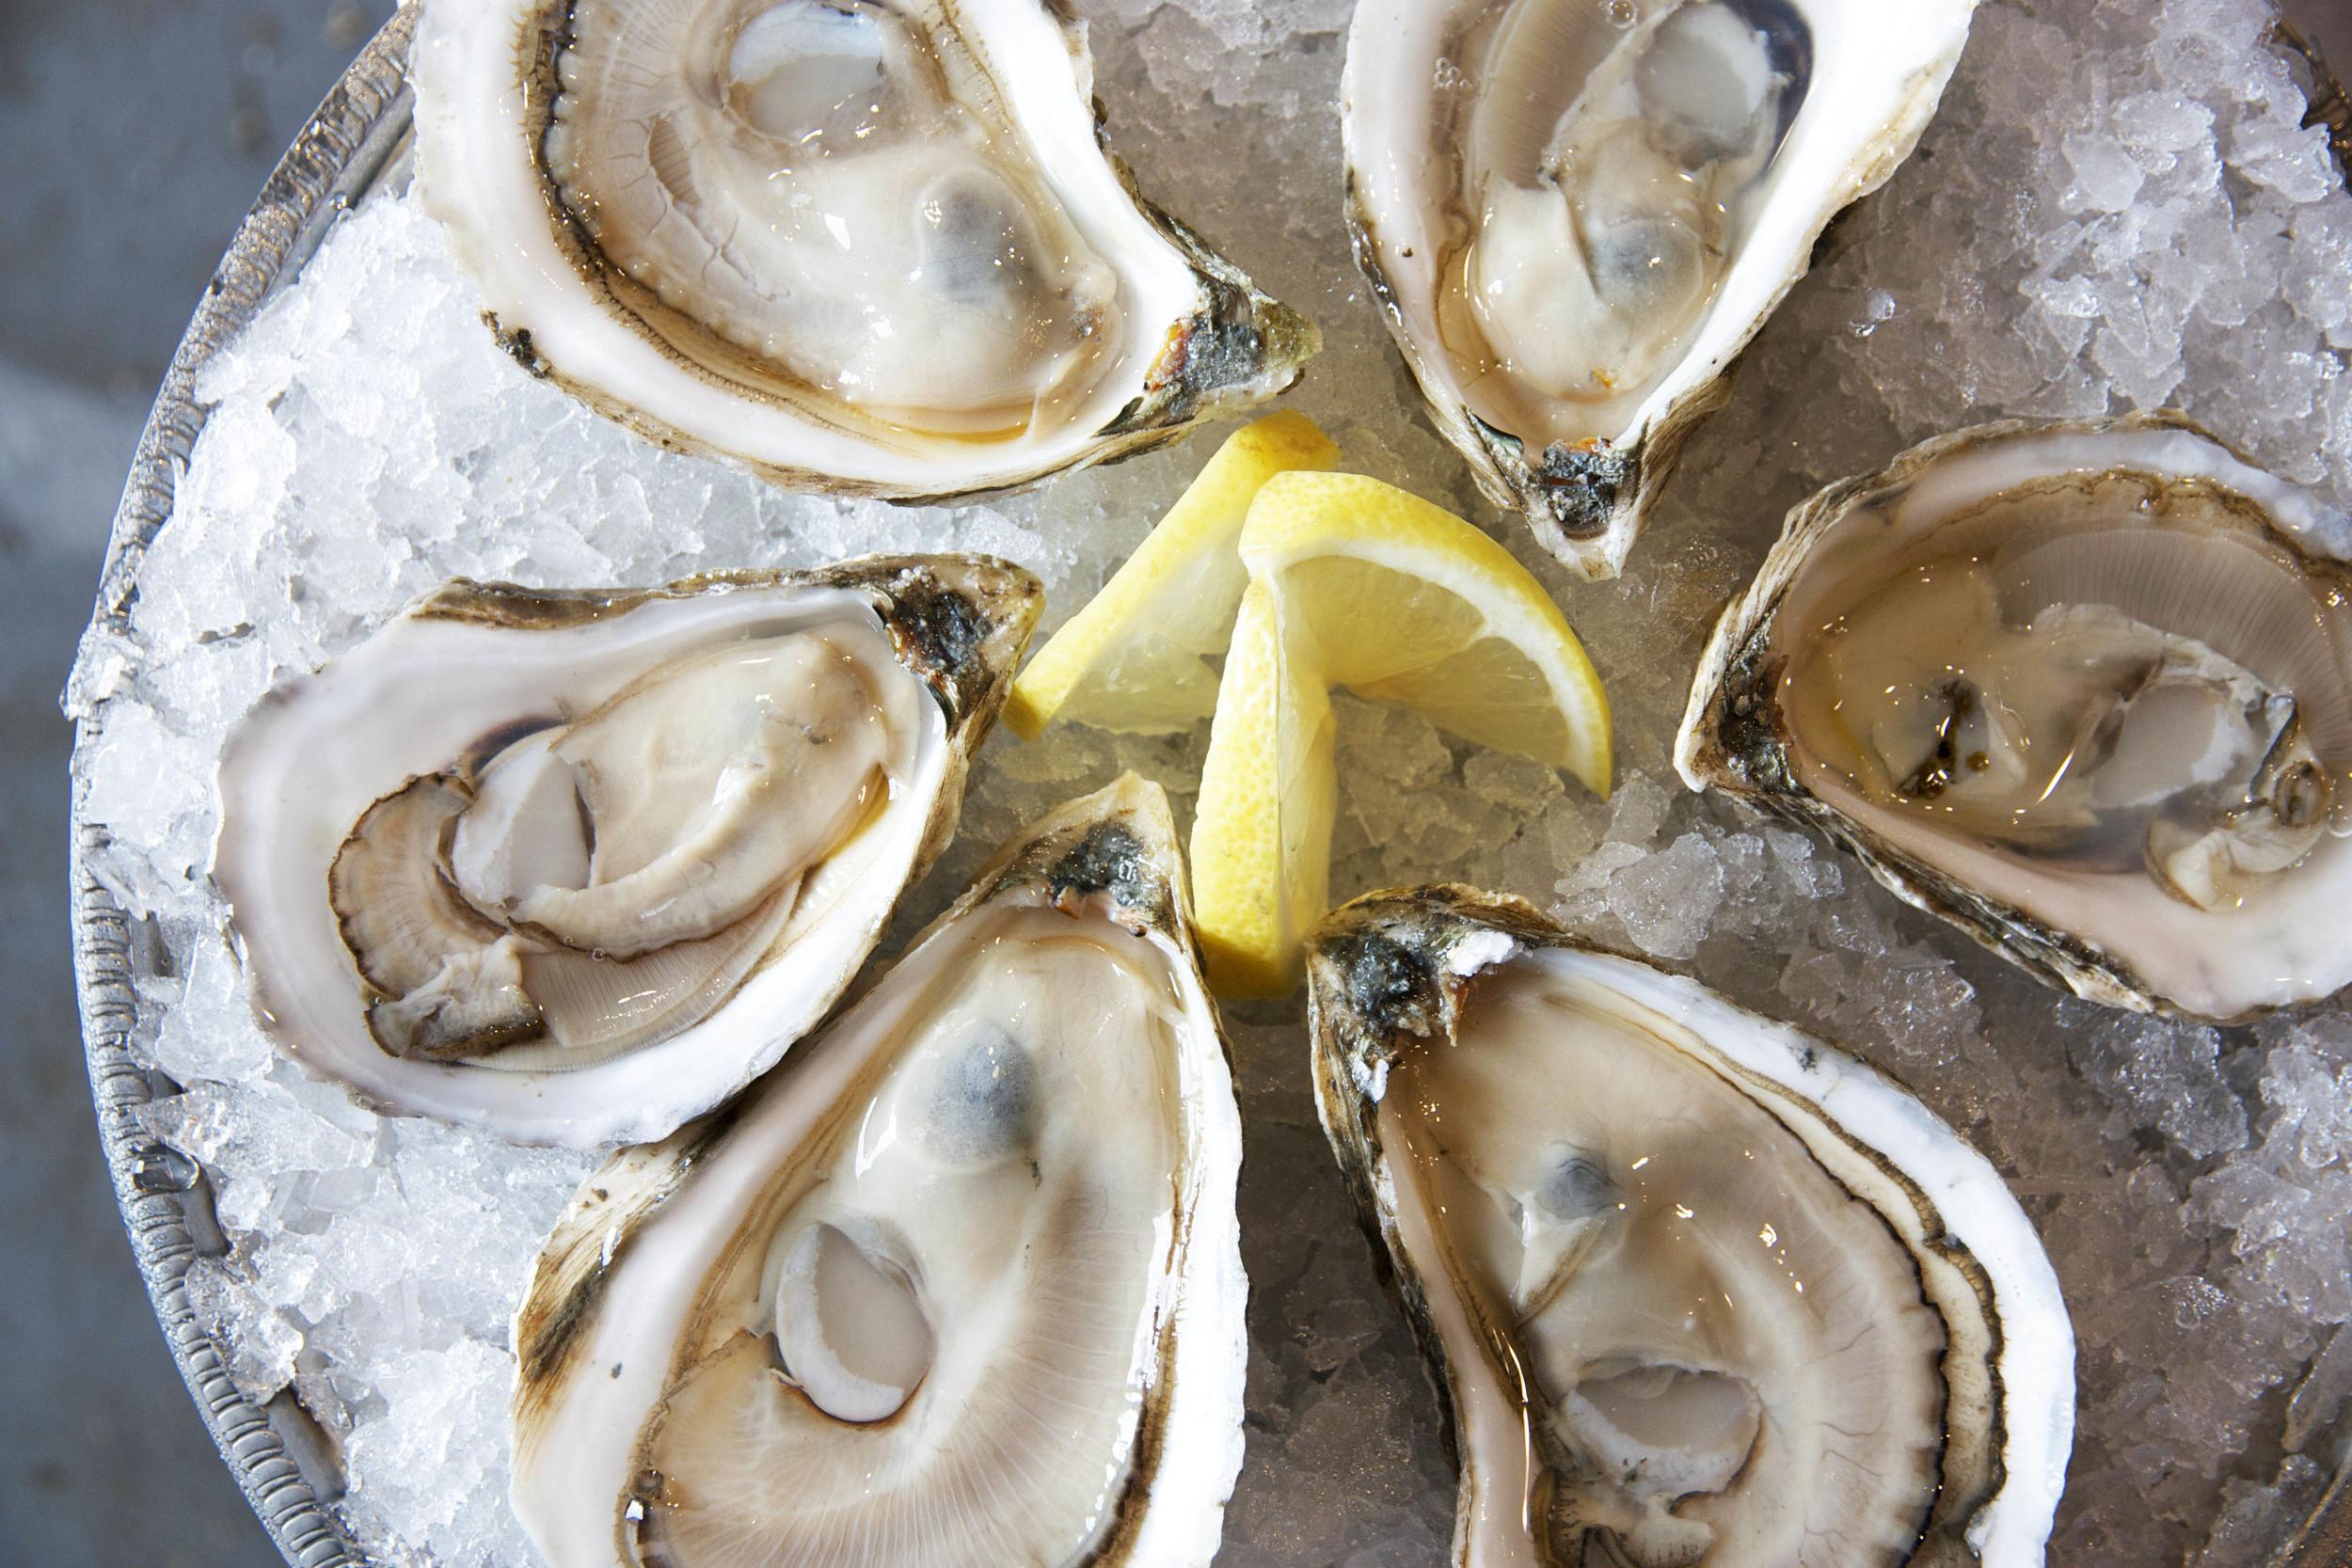 Pangea Shellfish Pemaquid Oysters On Ice.jpg